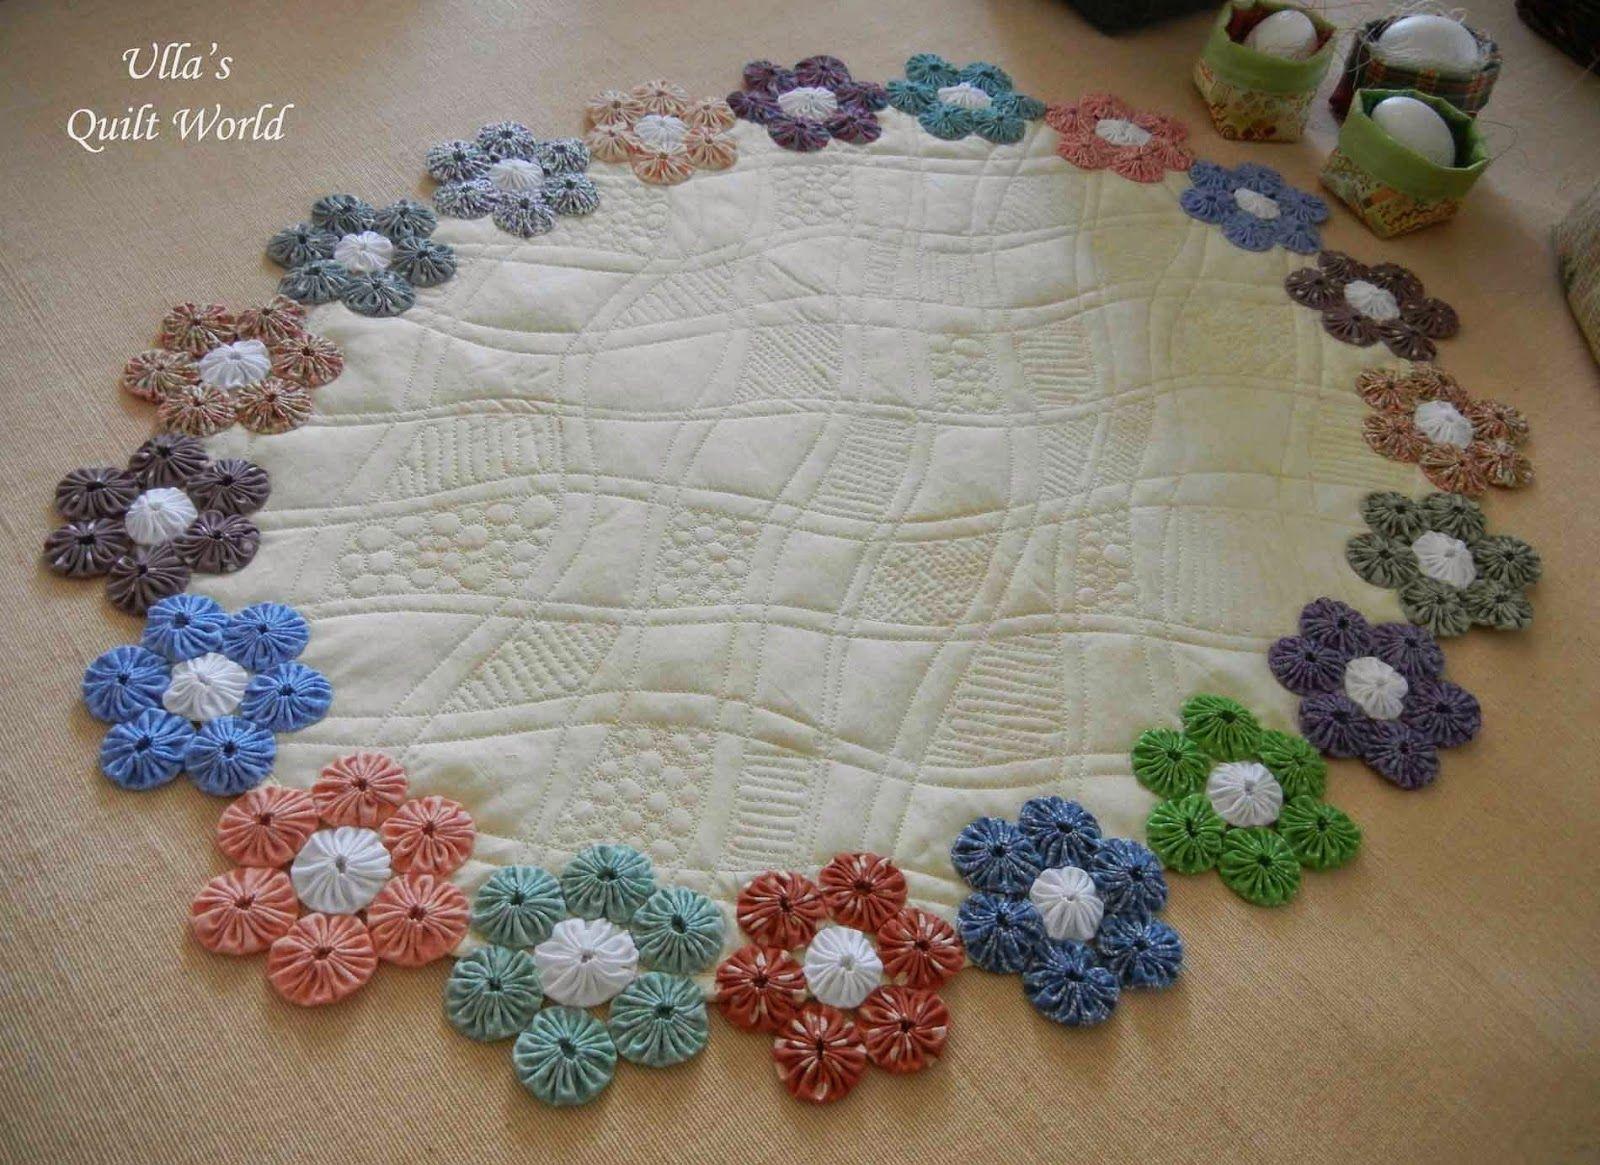 Applique designs for tablecloth - Patterns